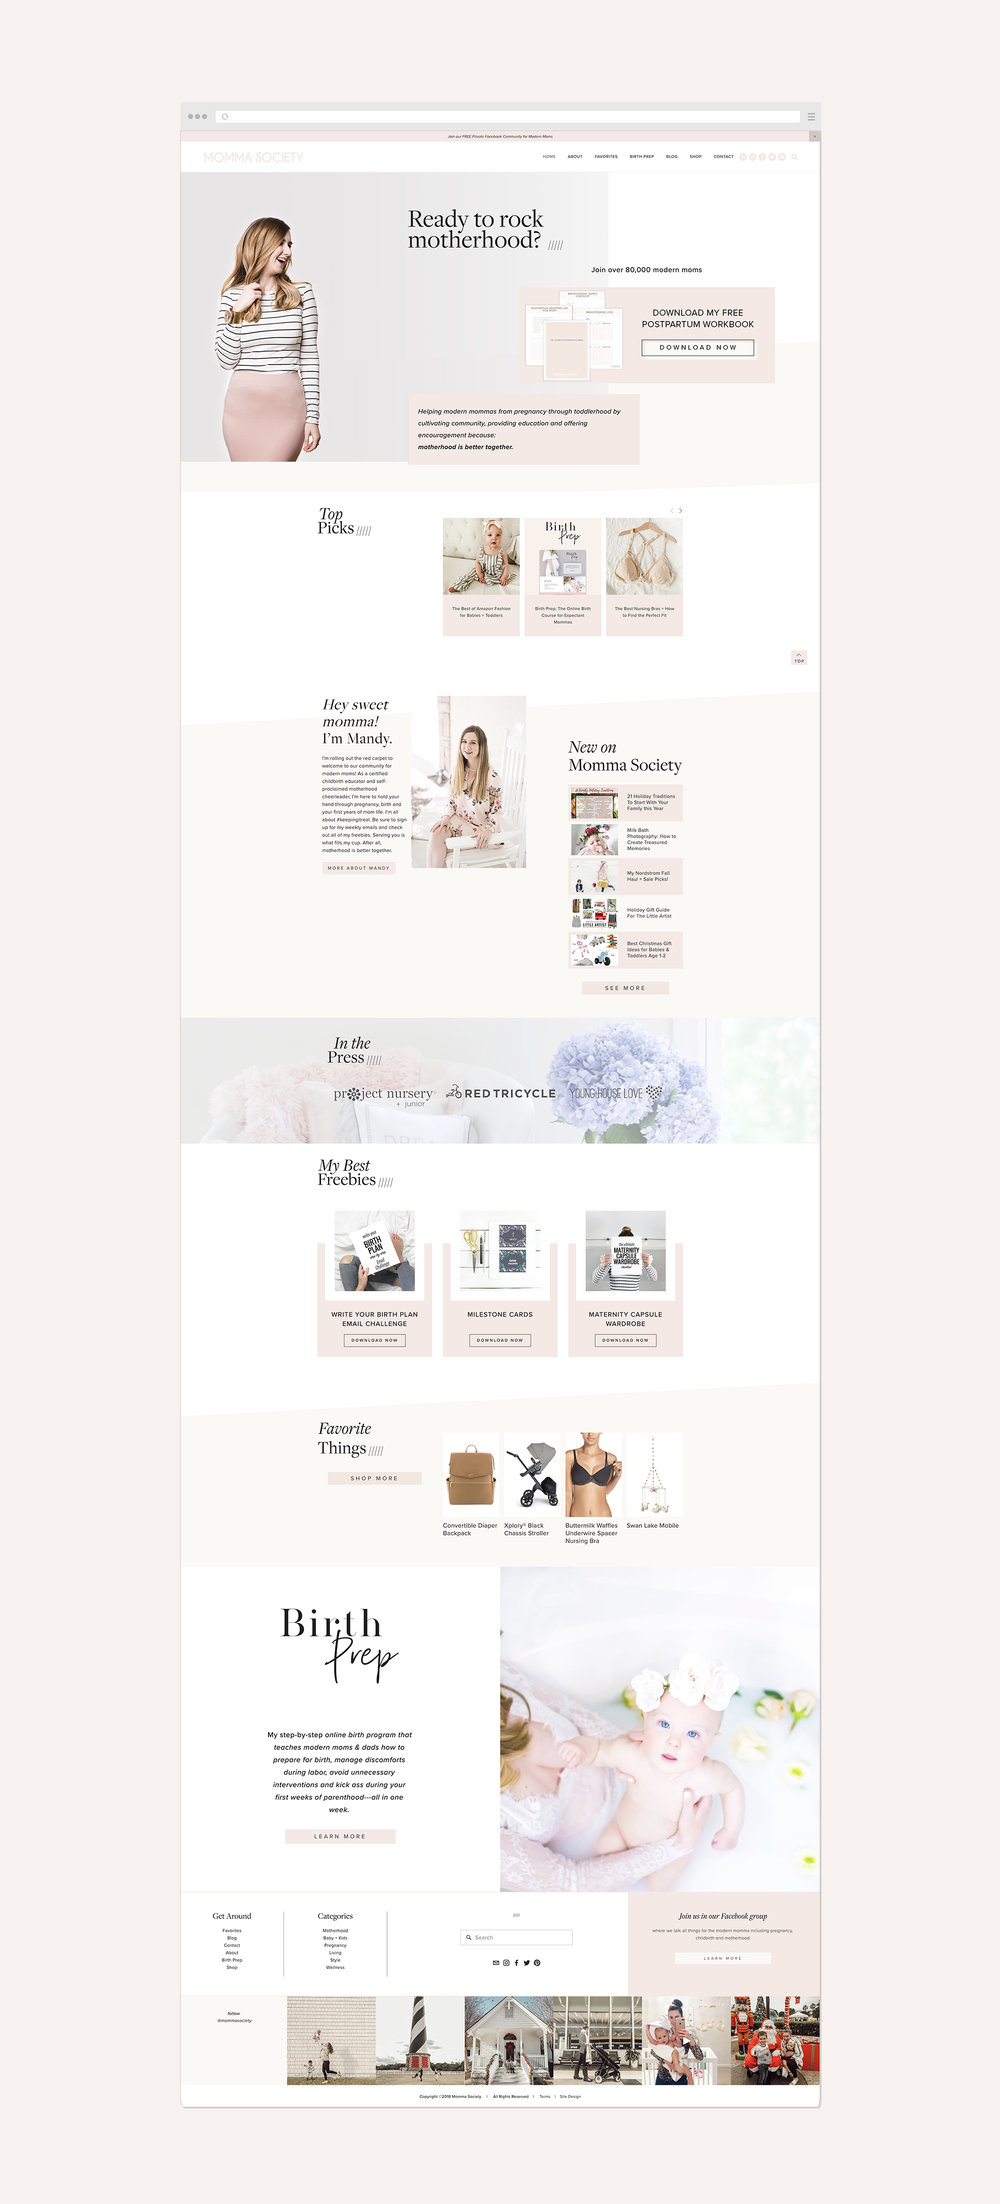 Momma Society   Motherhood blog and business   Squarespace website design by Jodi Neufeld Design #squarespace #cleandesign #webdesign